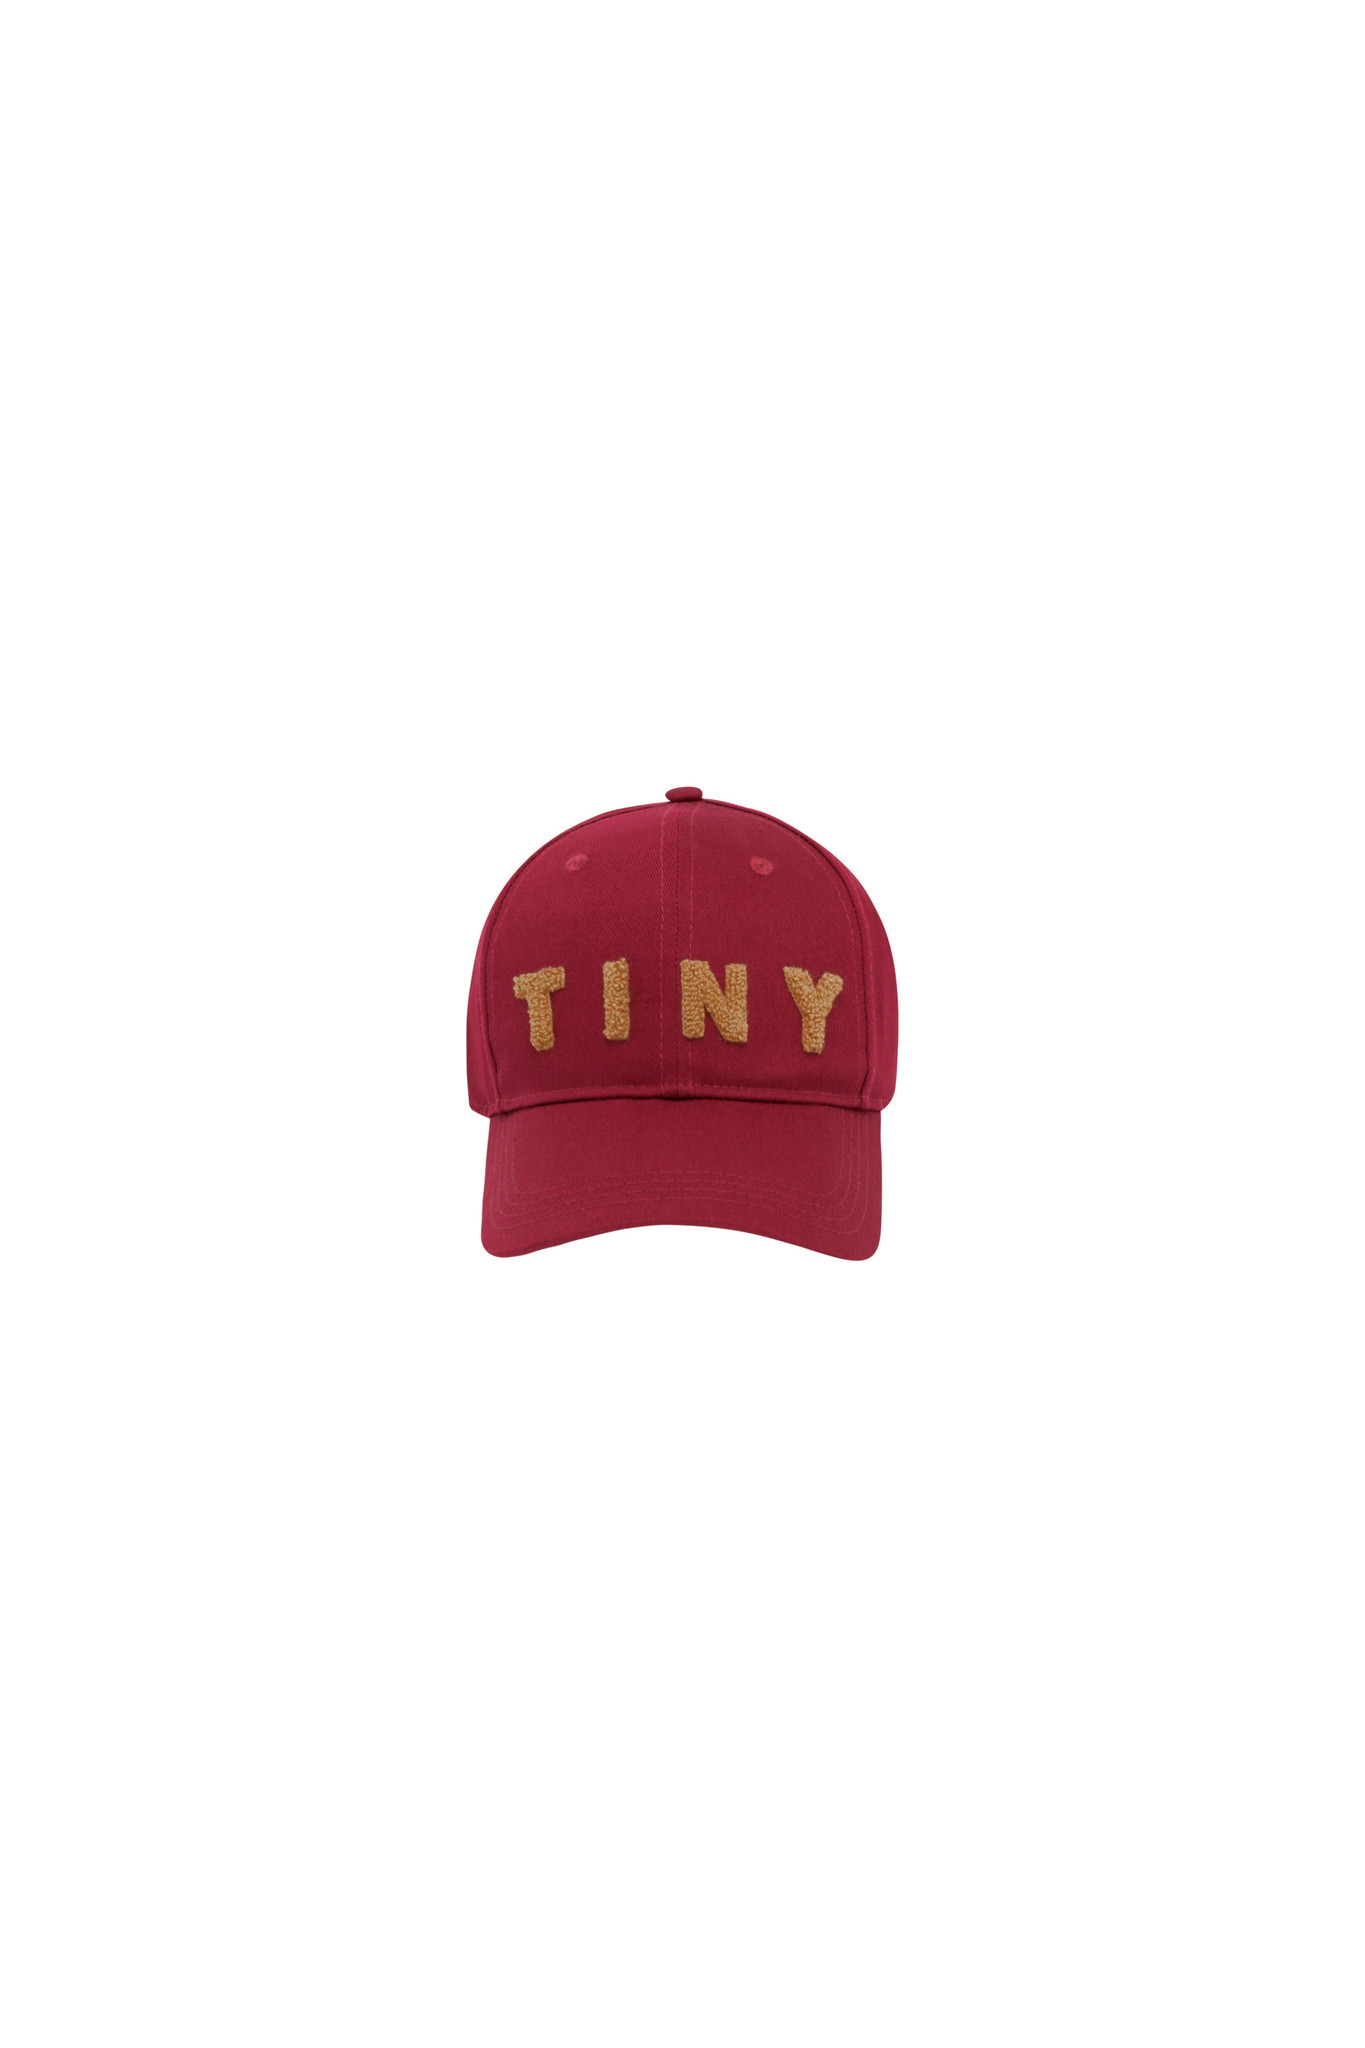 TINY CAP-1